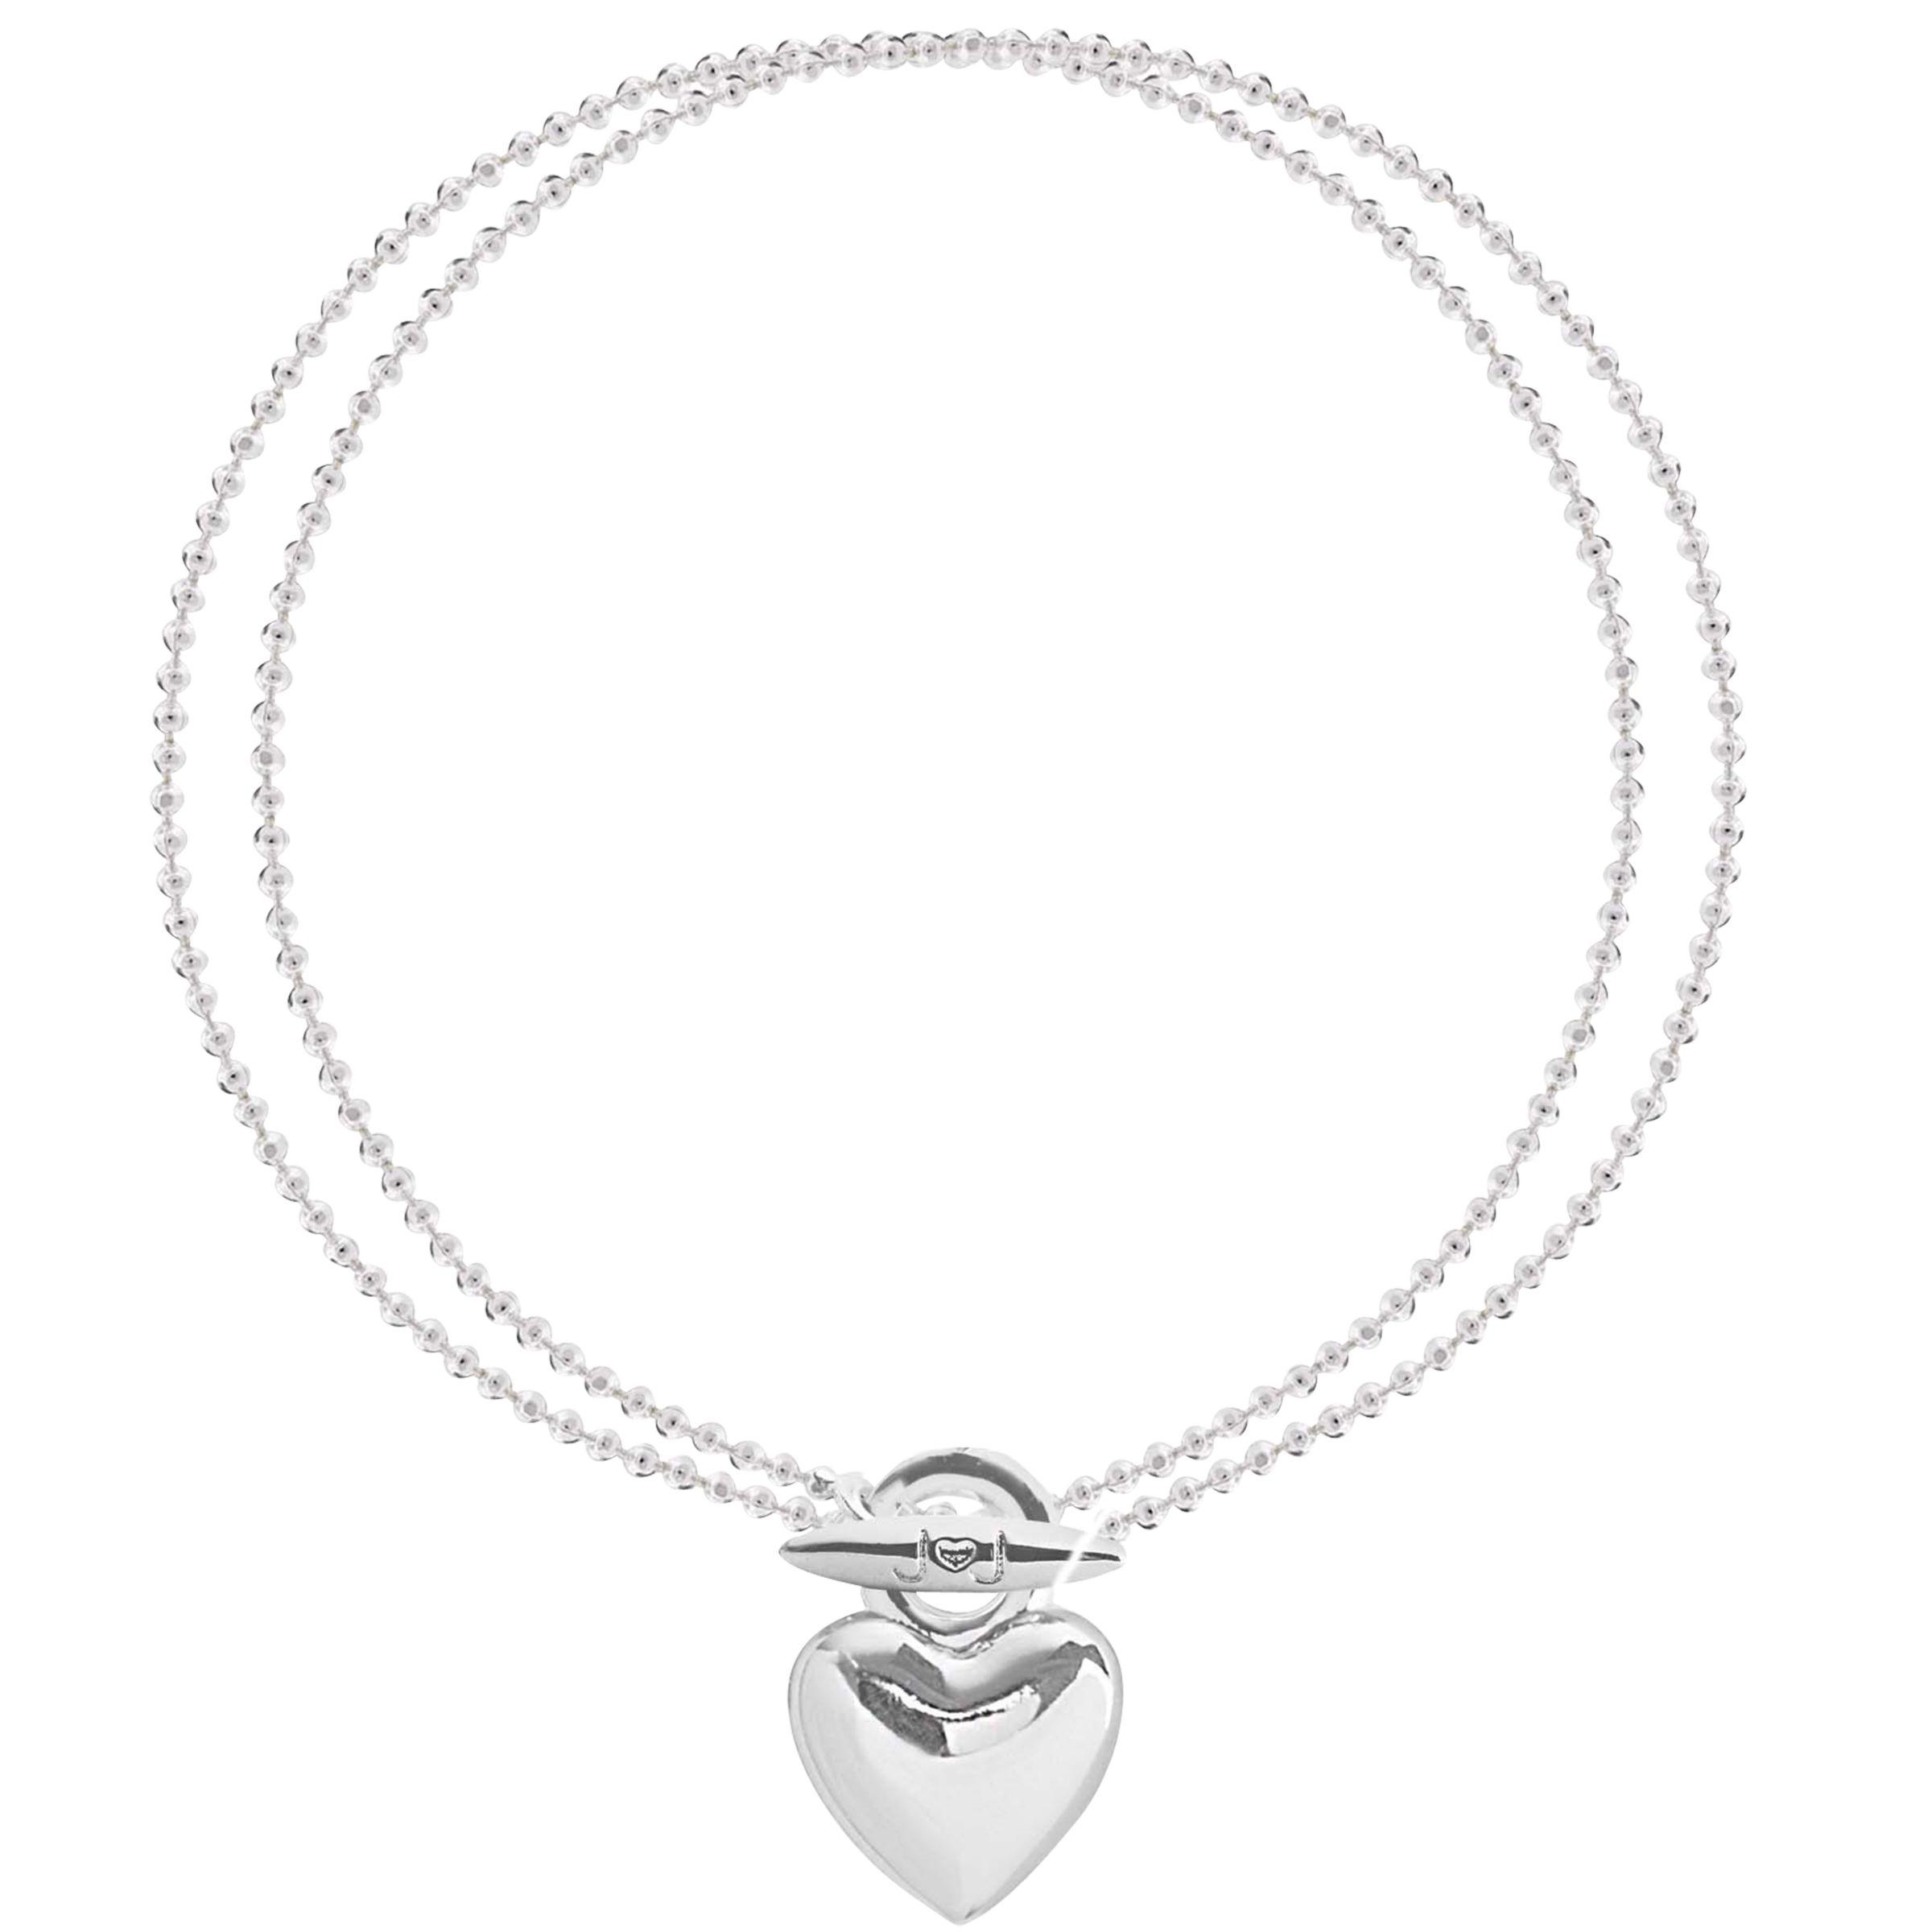 Joma Joma Looped Heart Bracelet, Silver